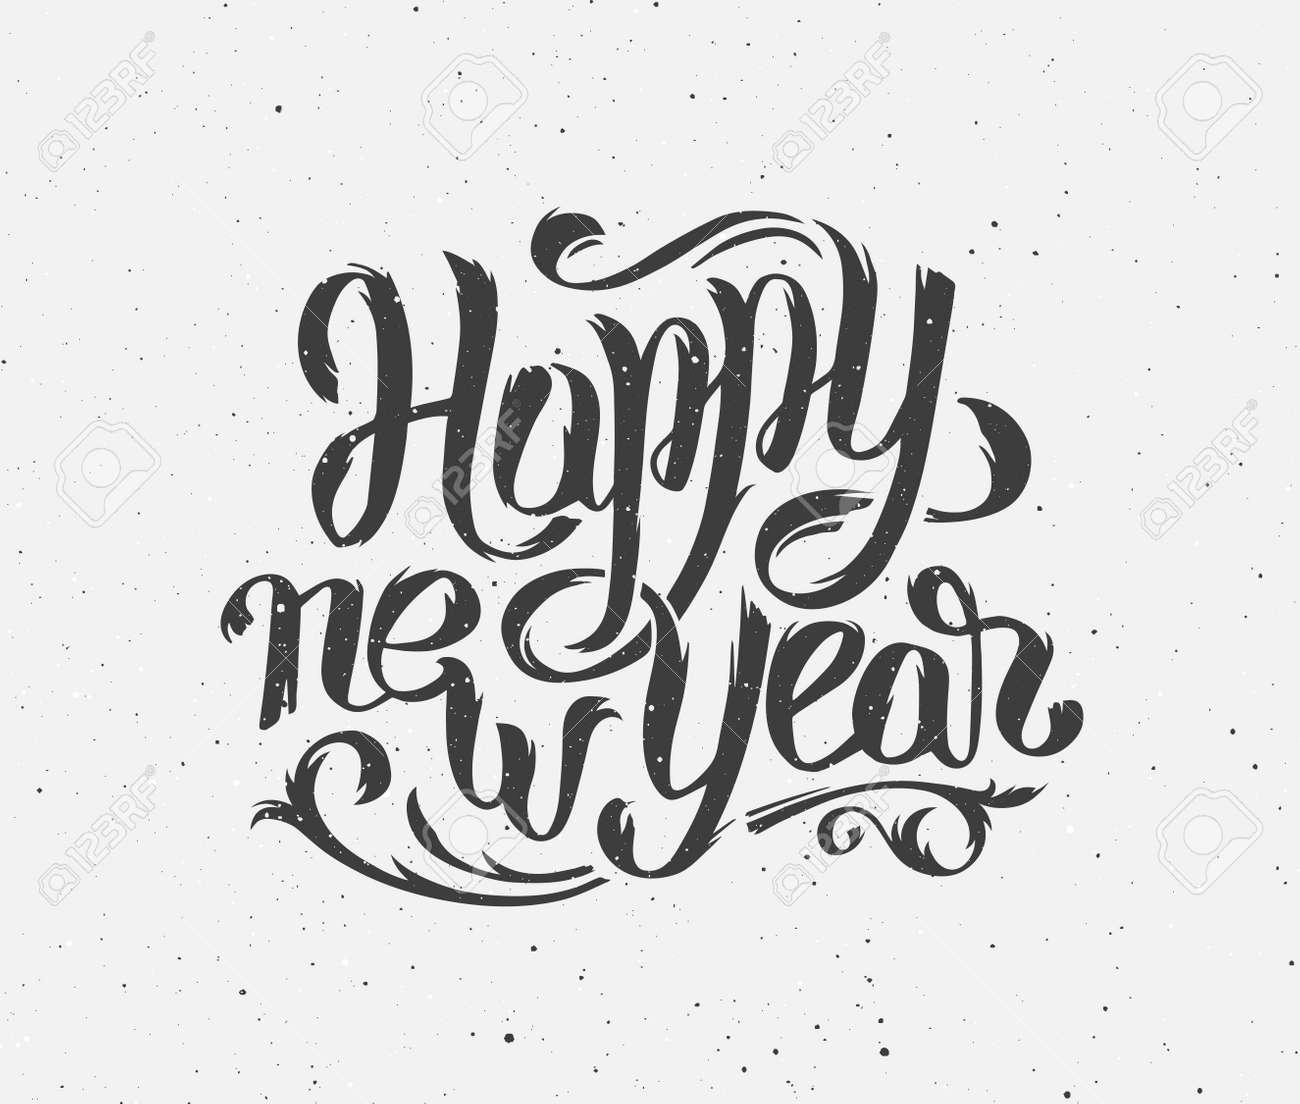 Happy New Year 2016 Handmade Greeting Card Design Chinese